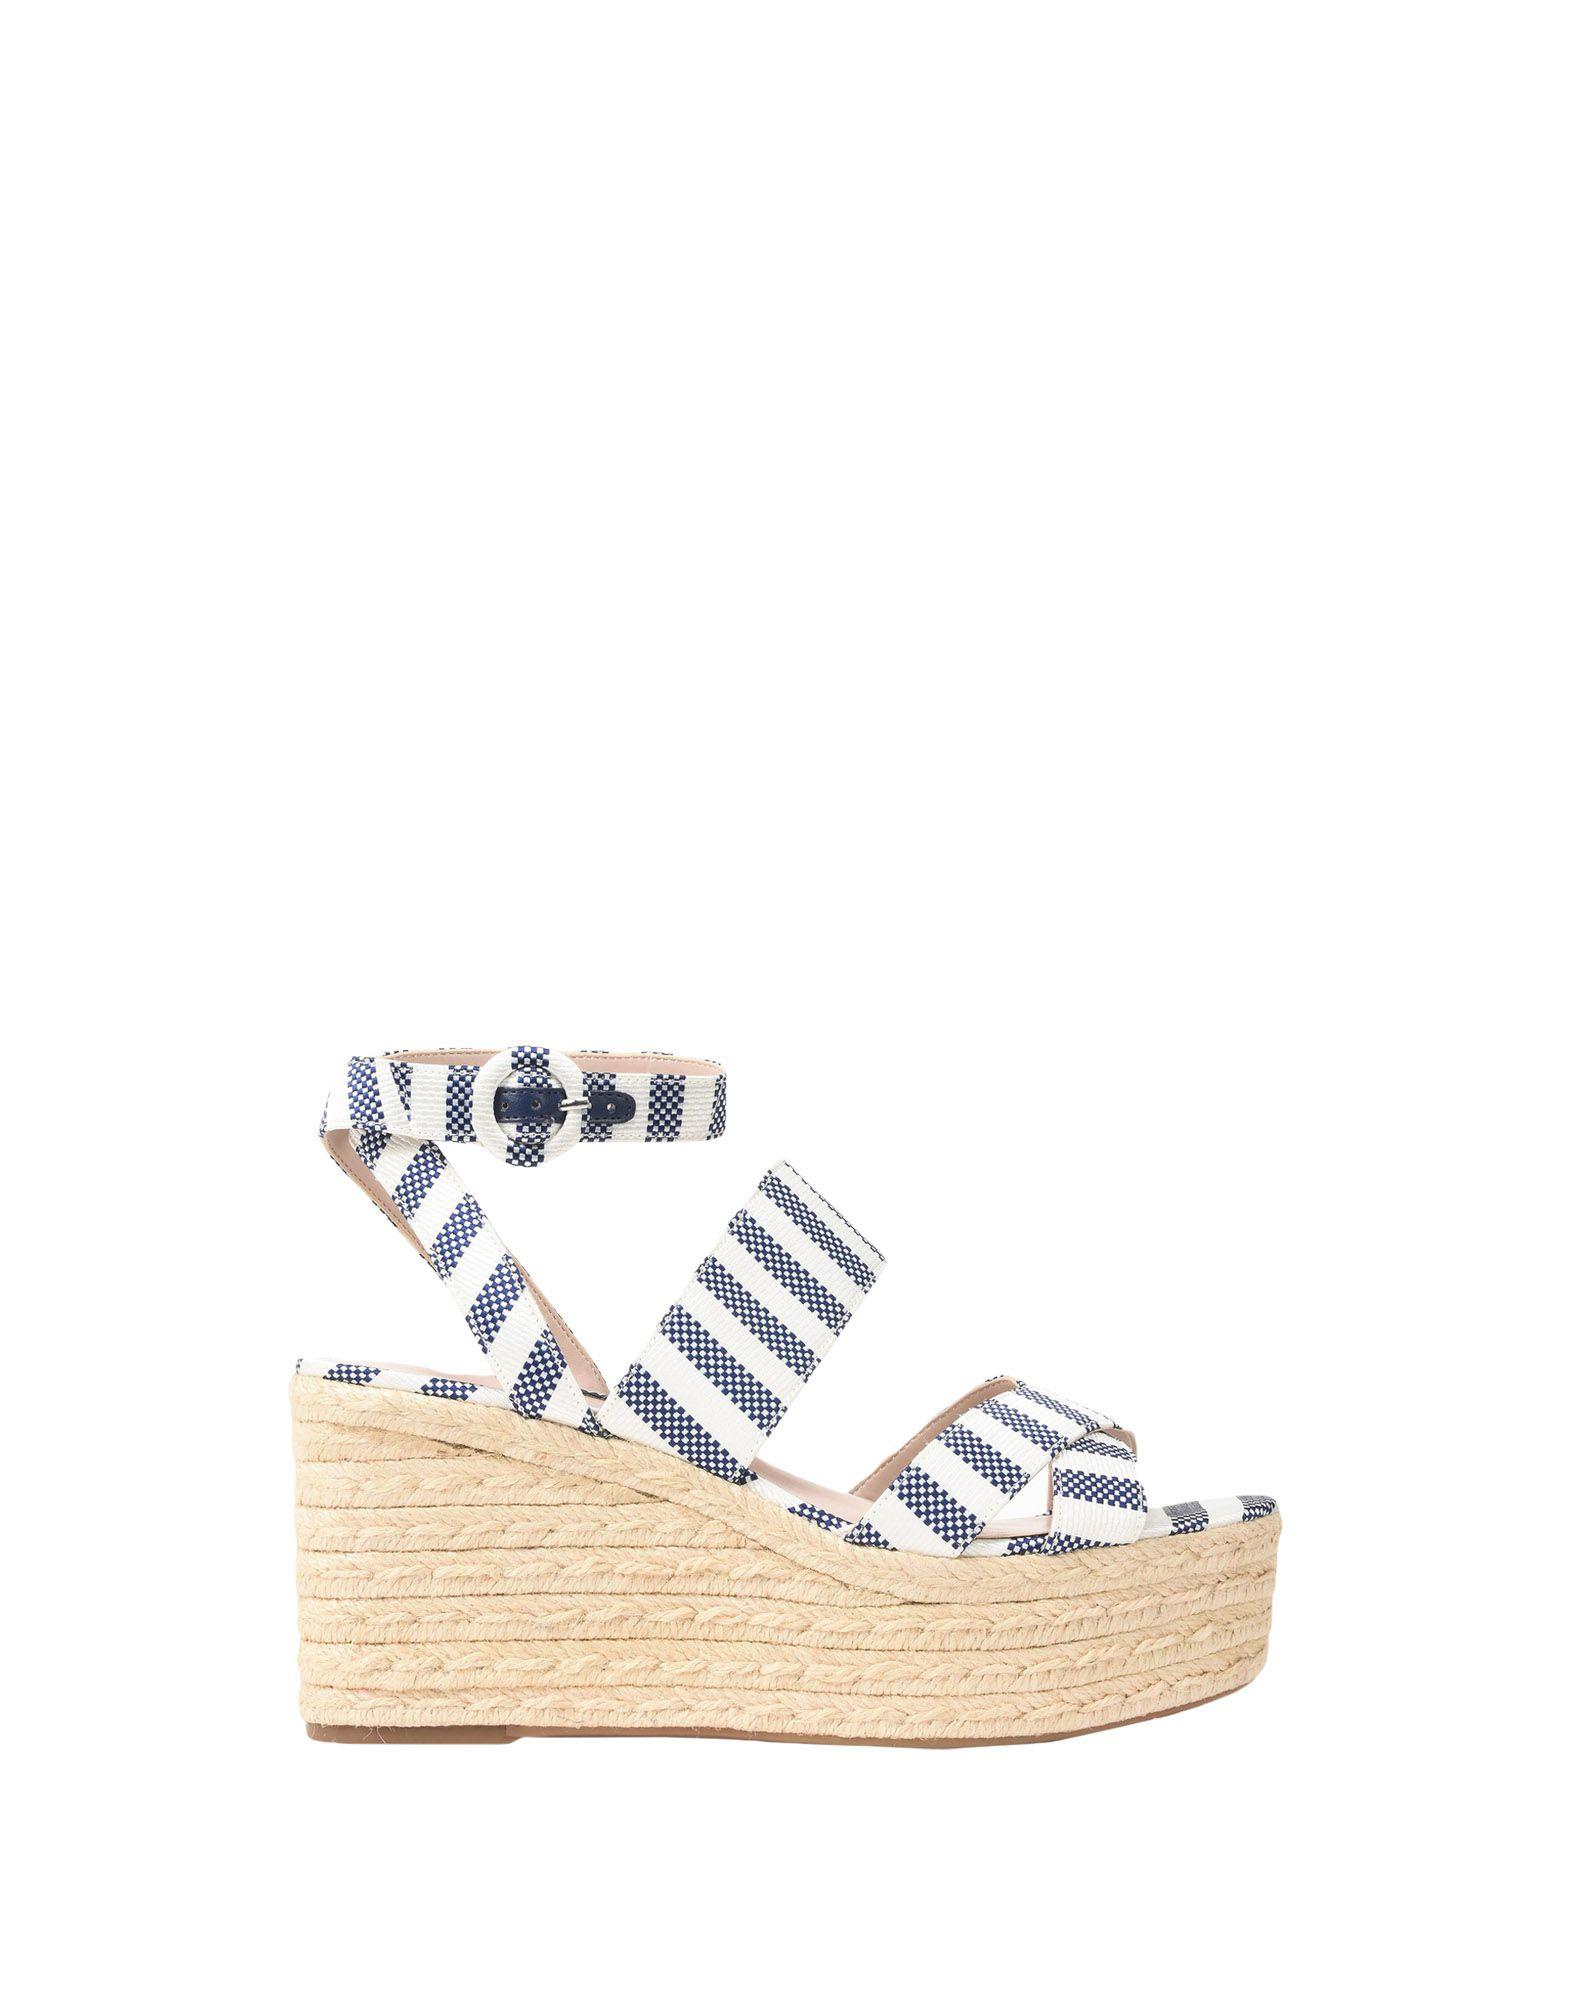 Nine West Kushala2  11483472OL Schuhe Gute Qualität beliebte Schuhe 11483472OL 78e807